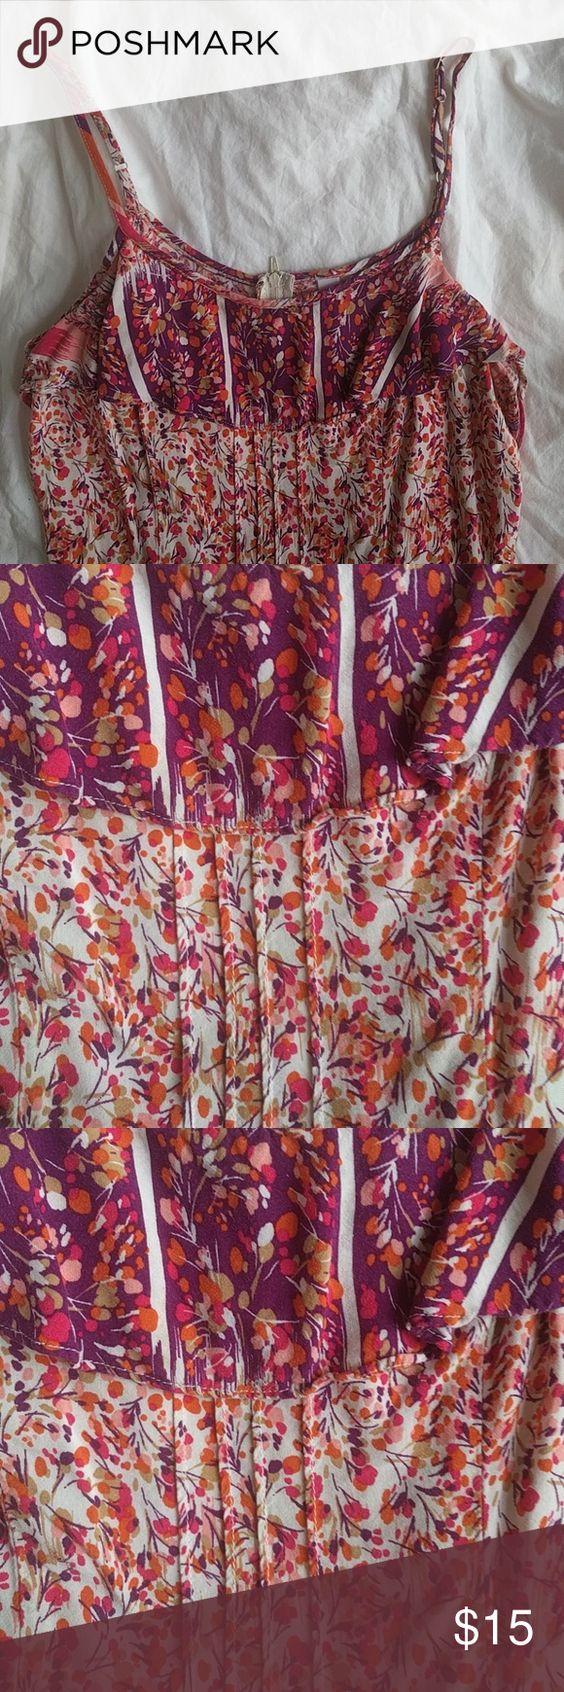 Floral sundress dress Purple and orange floral sundress Xhilaration Dresses Mini